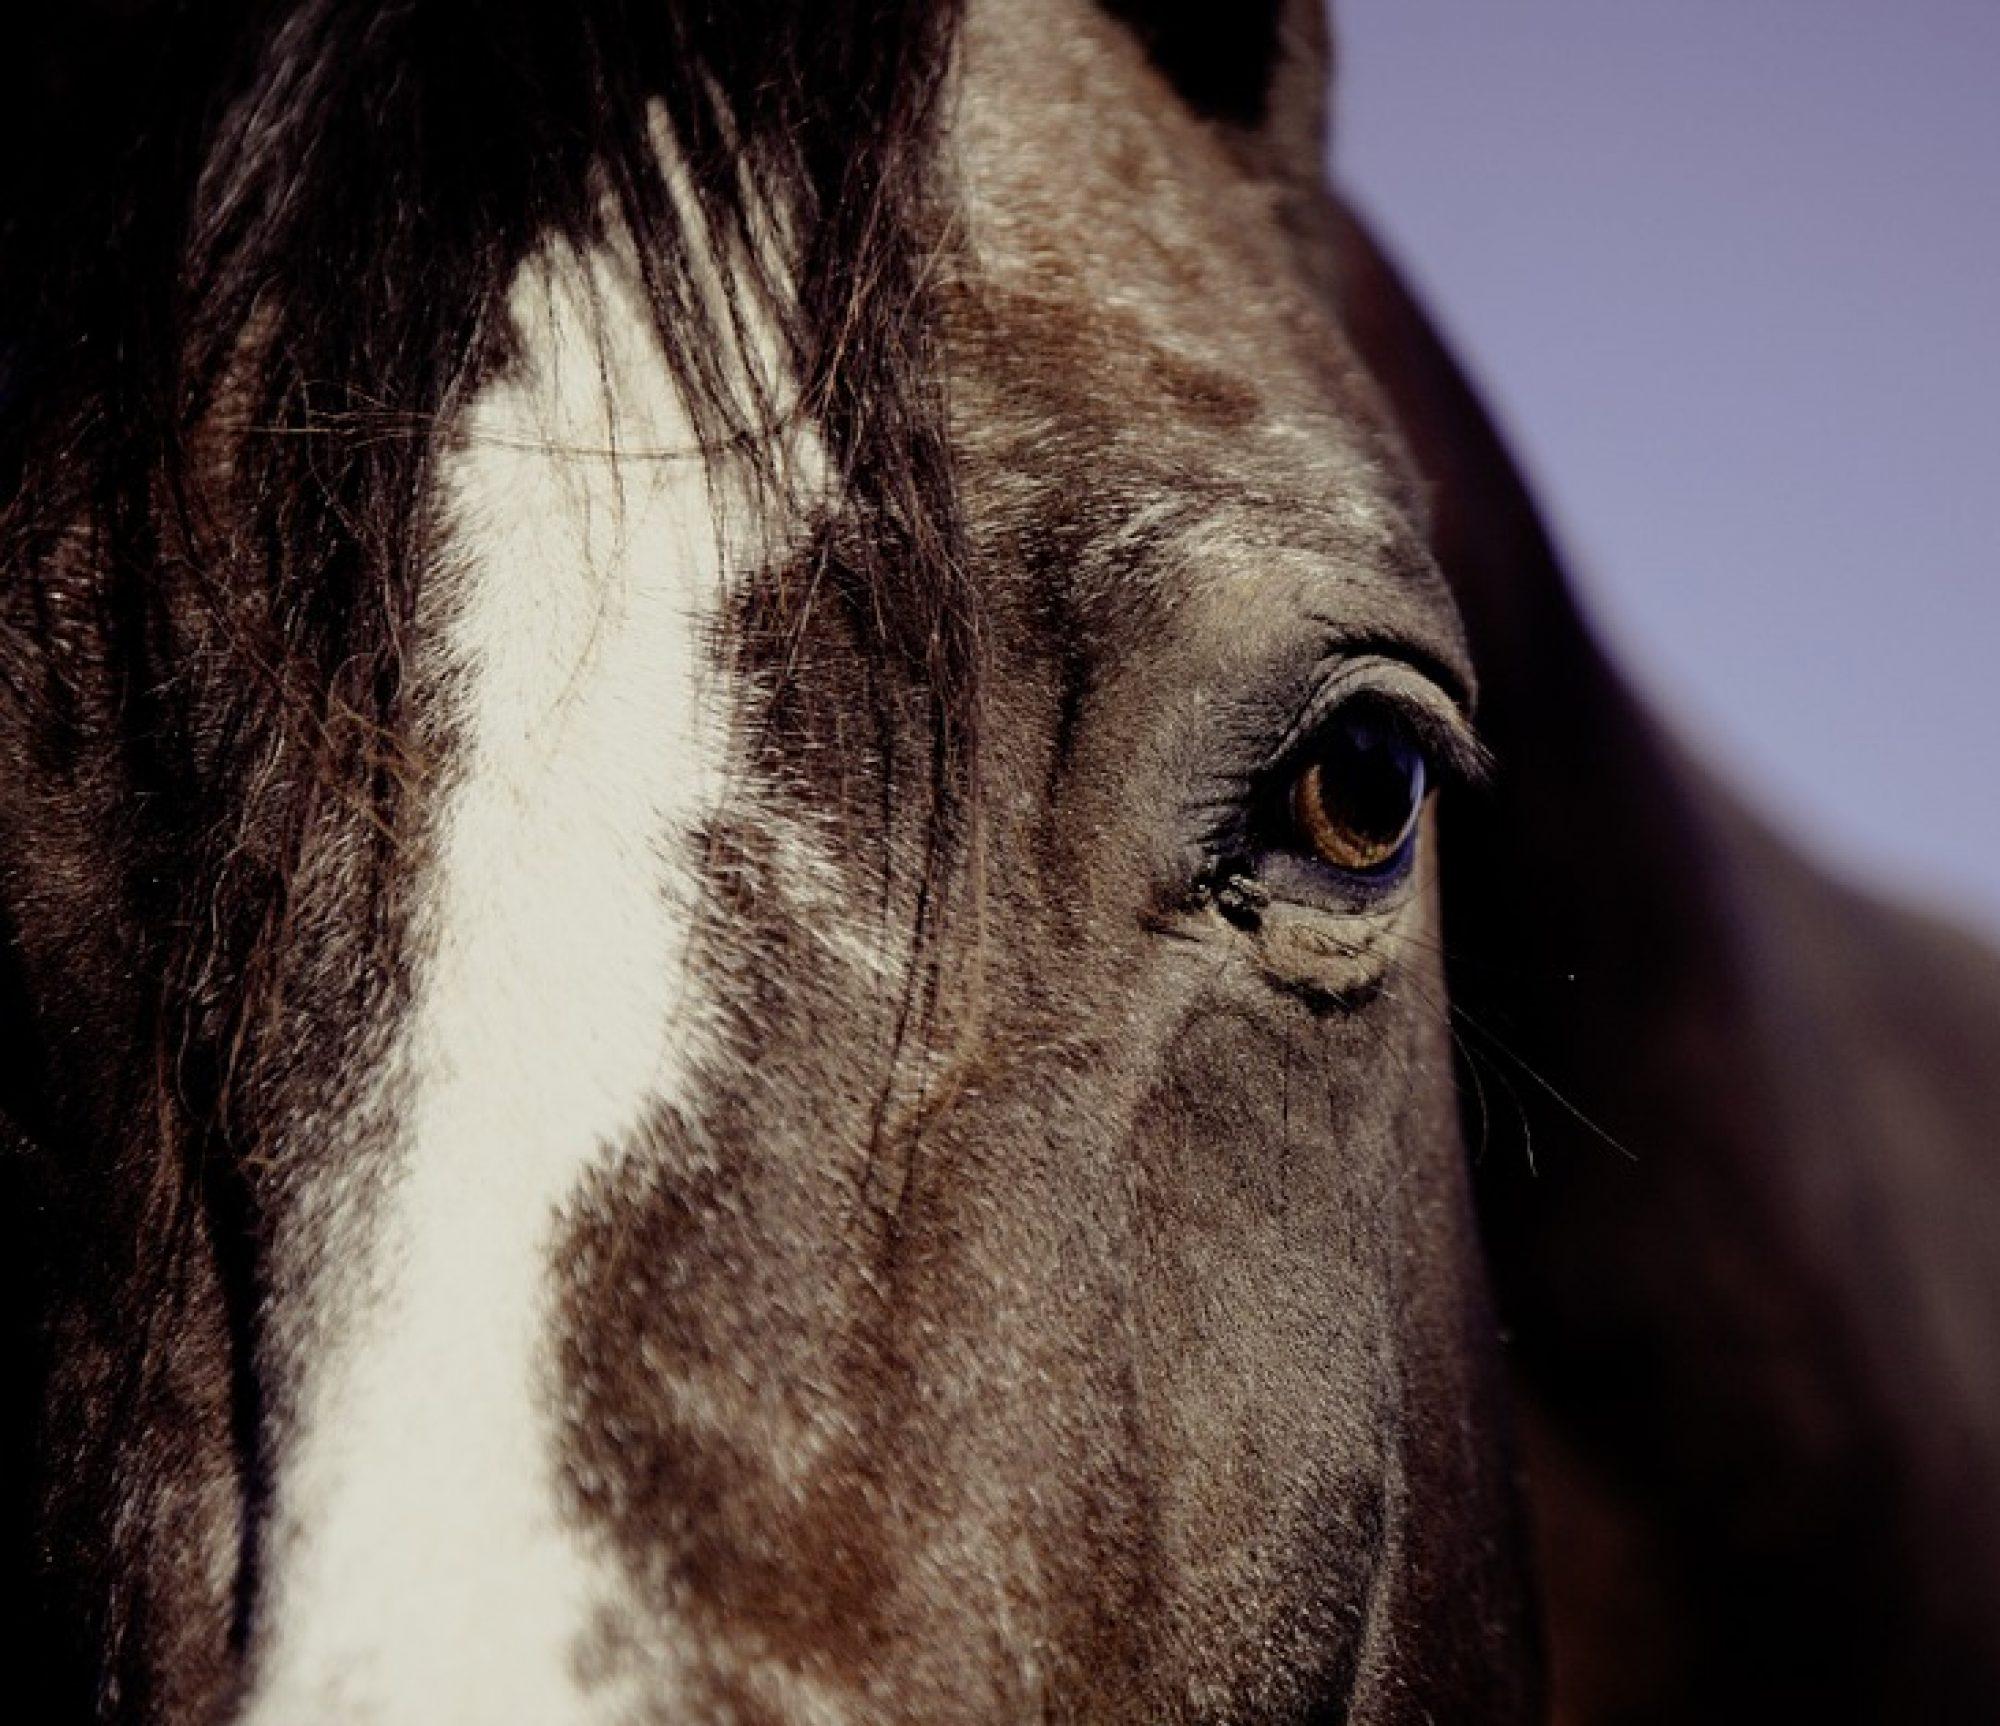 cropped-horse-594191_960_720-OJO.jpg